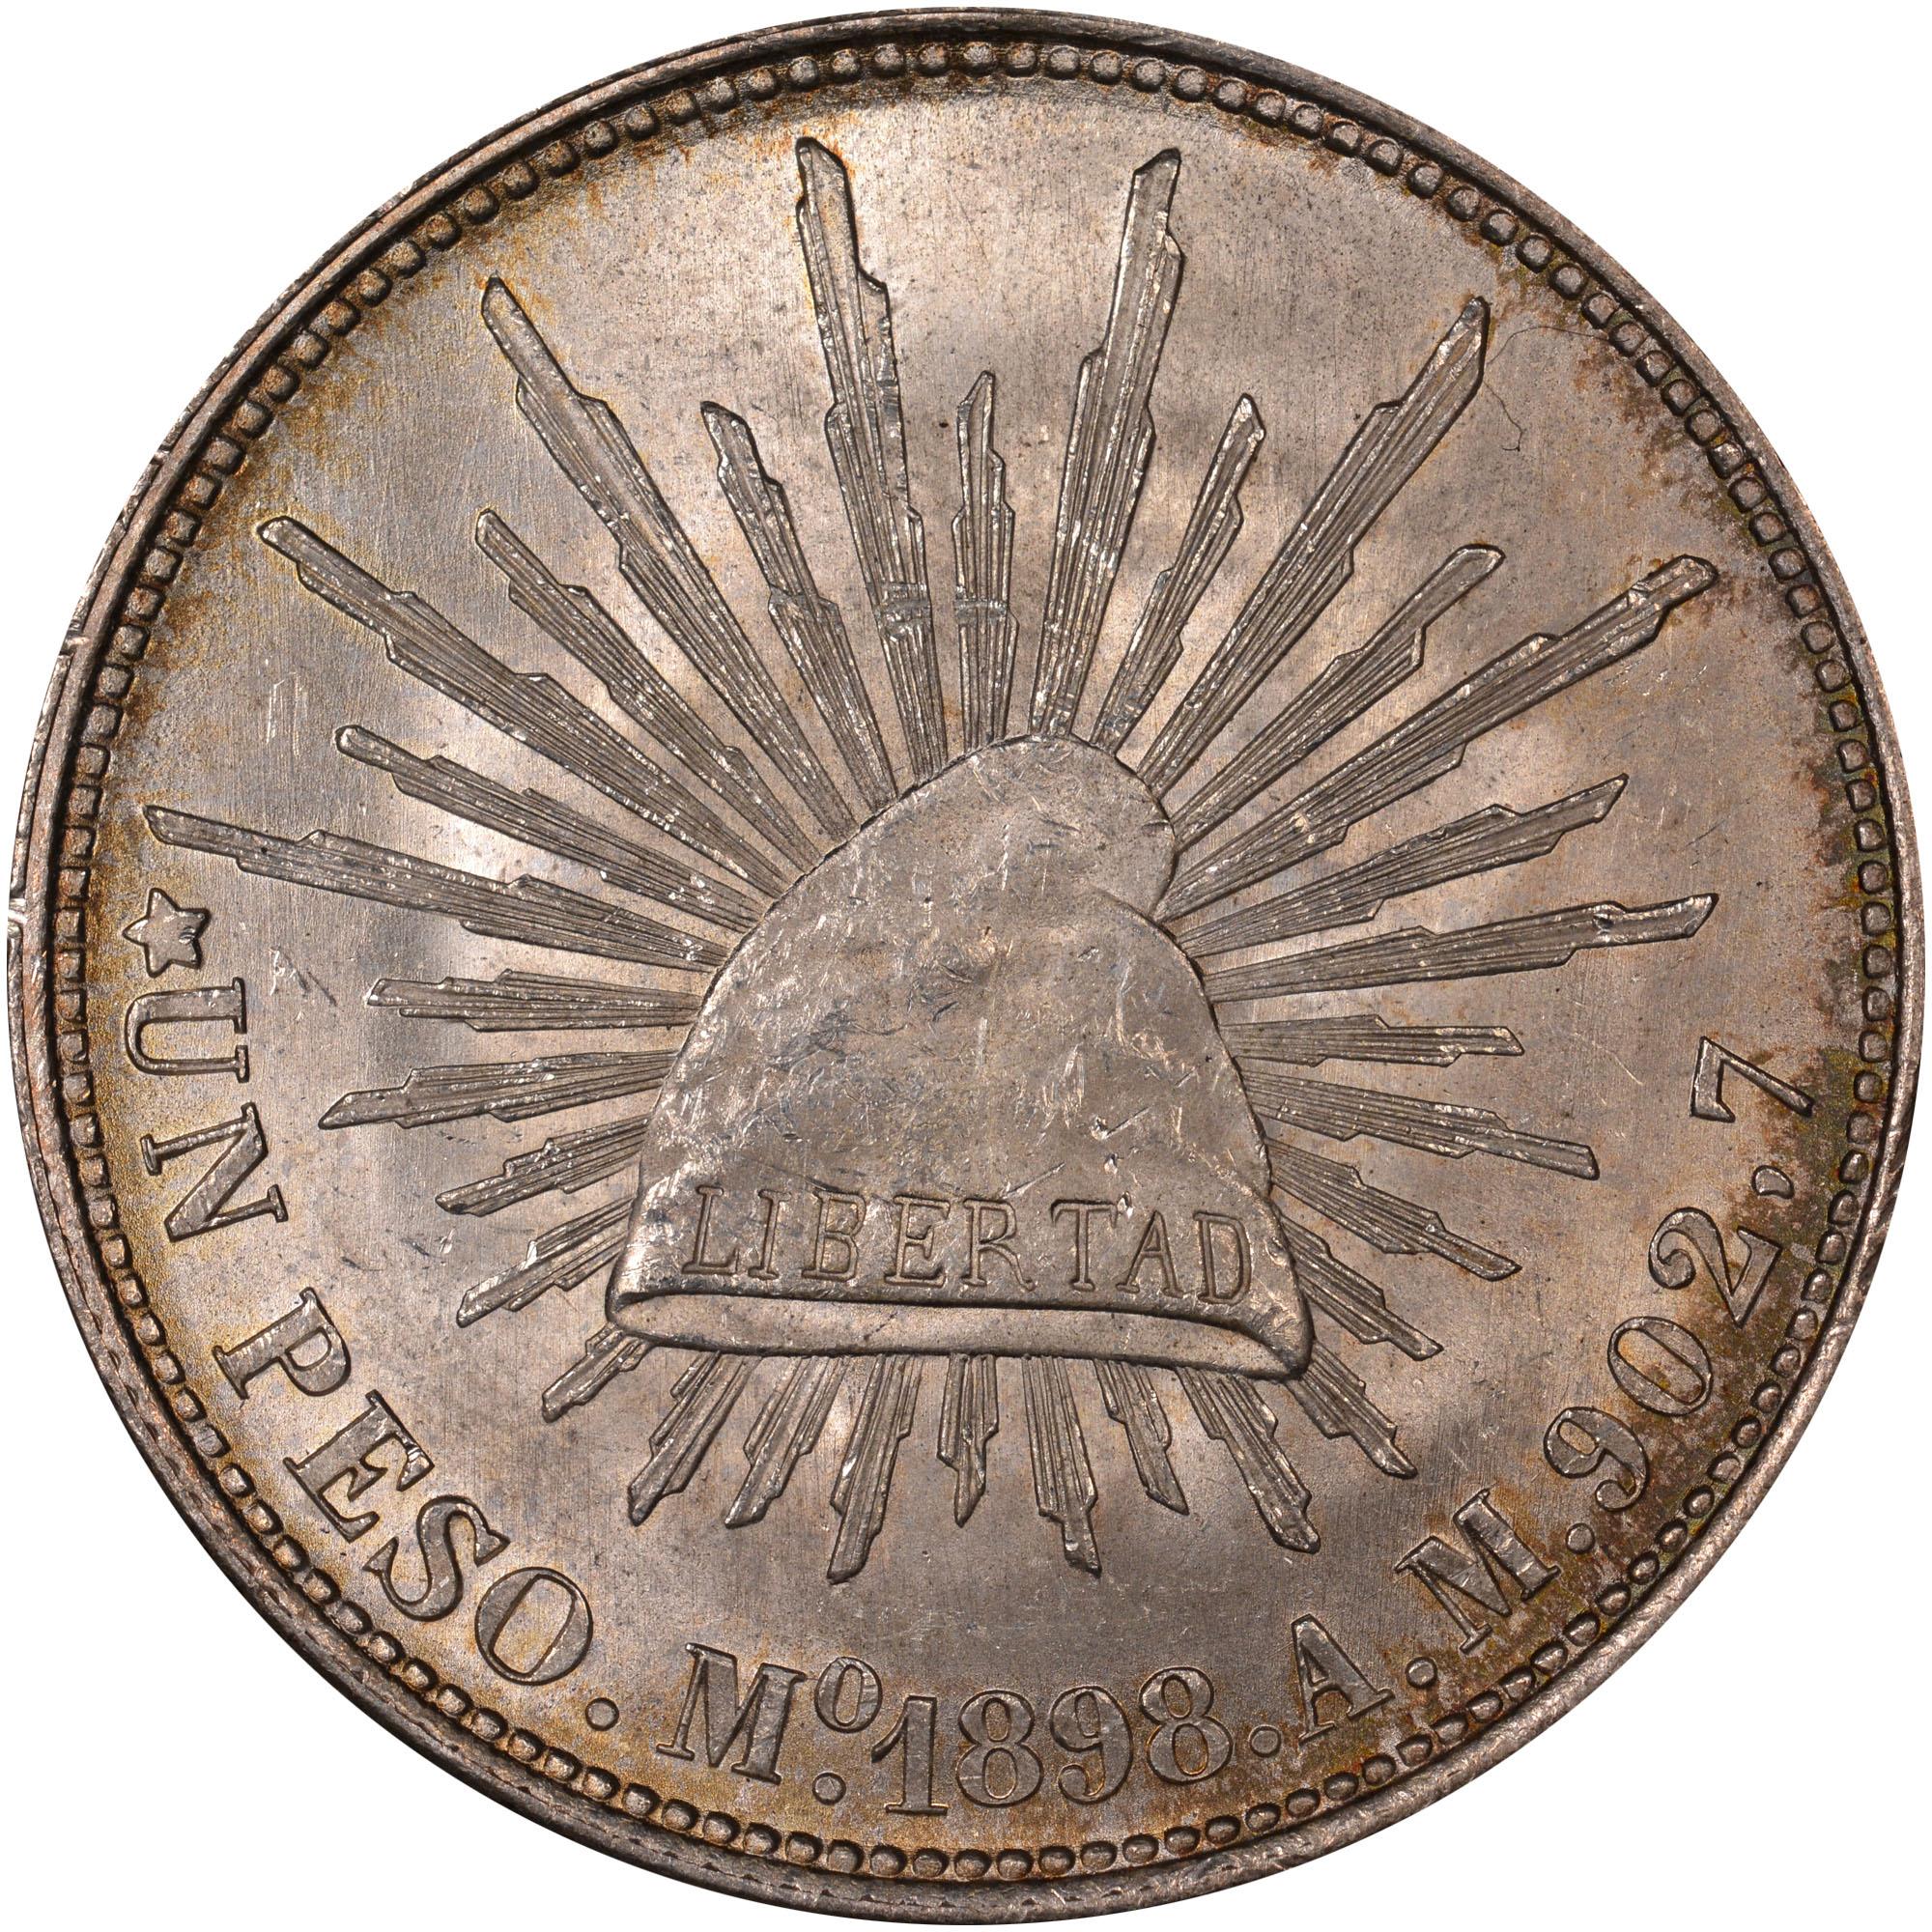 Mexico SECOND REPUBLIC Peso KM 409 2 Prices & Values | NGC